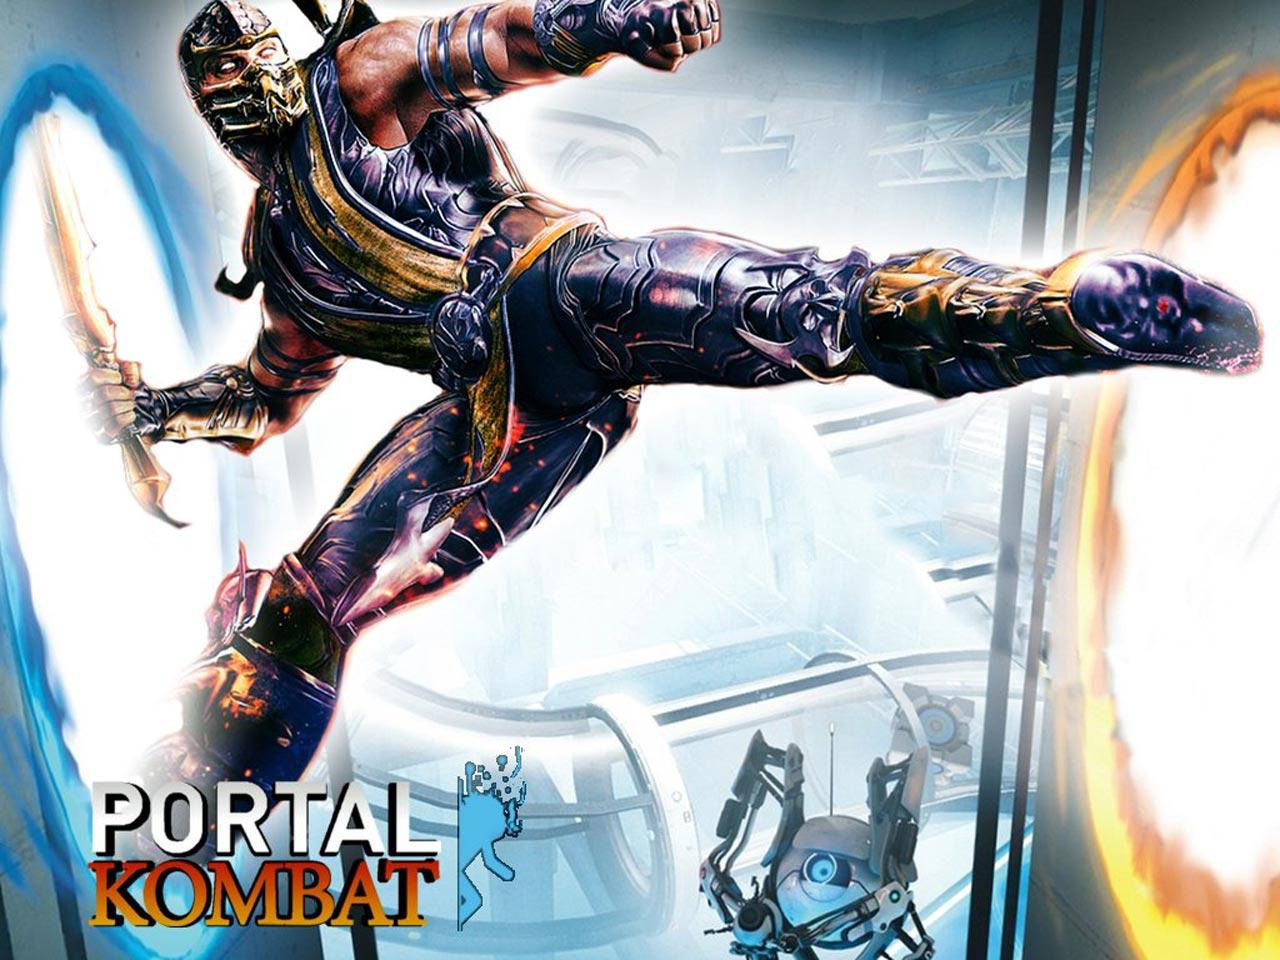 Mortal Kombat 9 Portal Kombat Wallpaper 1280x960